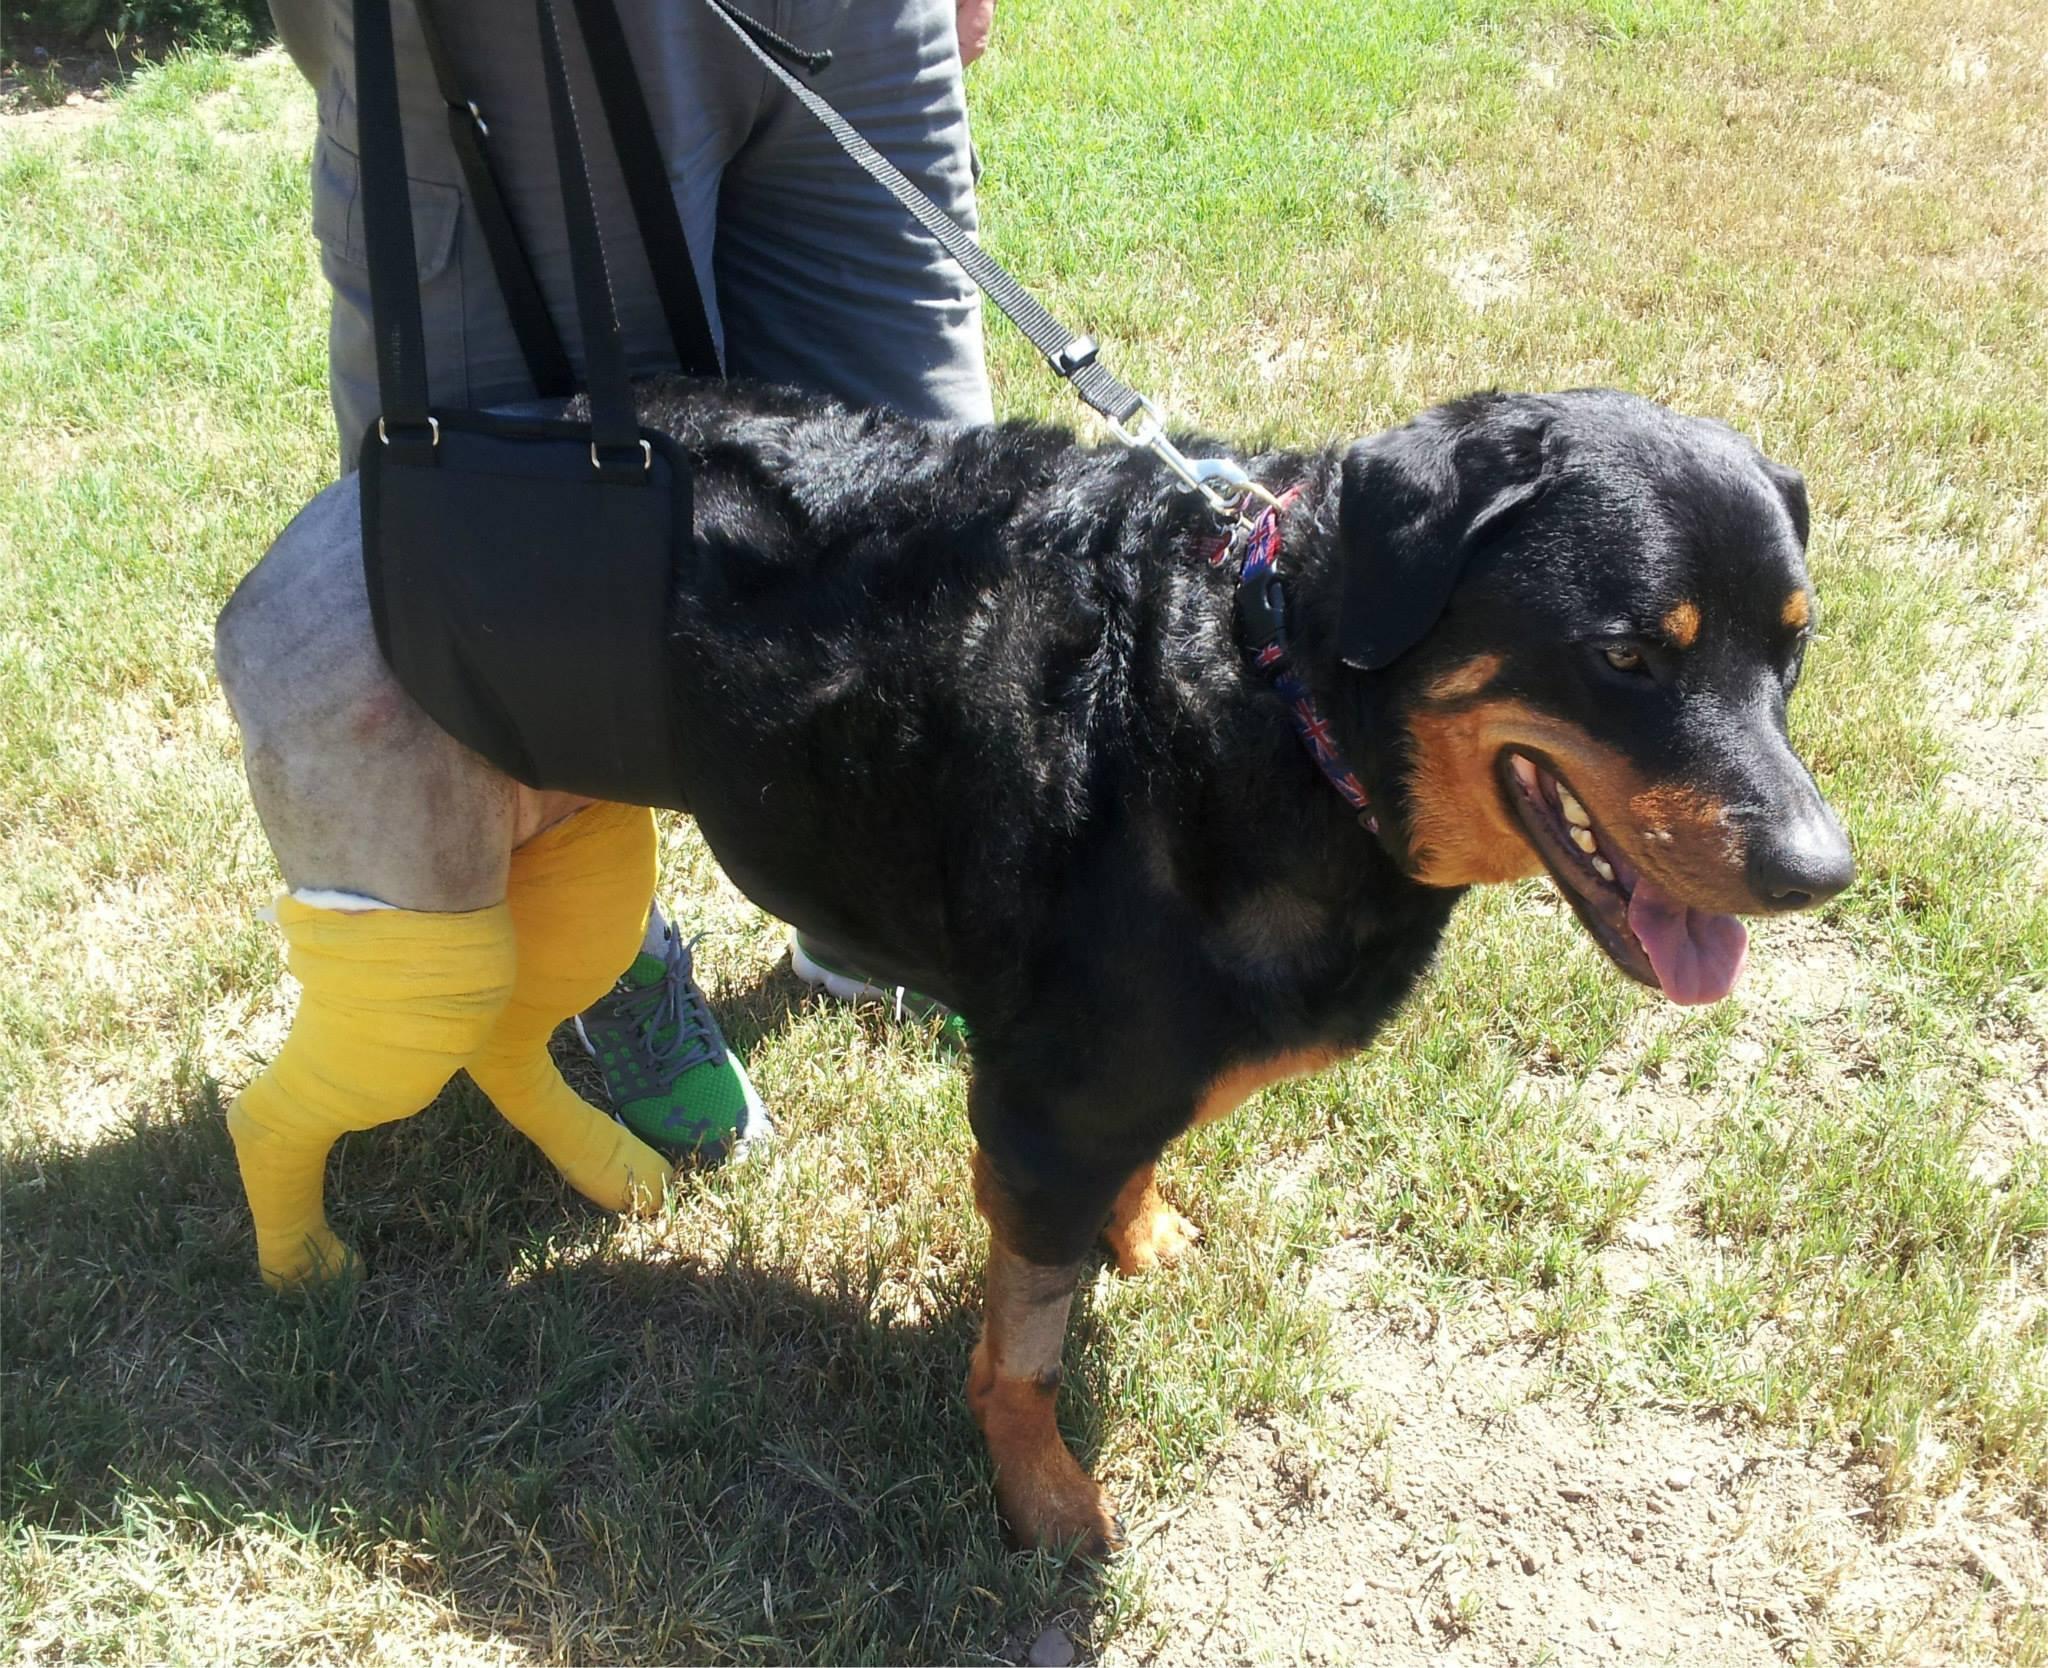 rottweiler dog using GingerLead support harness for rear legs